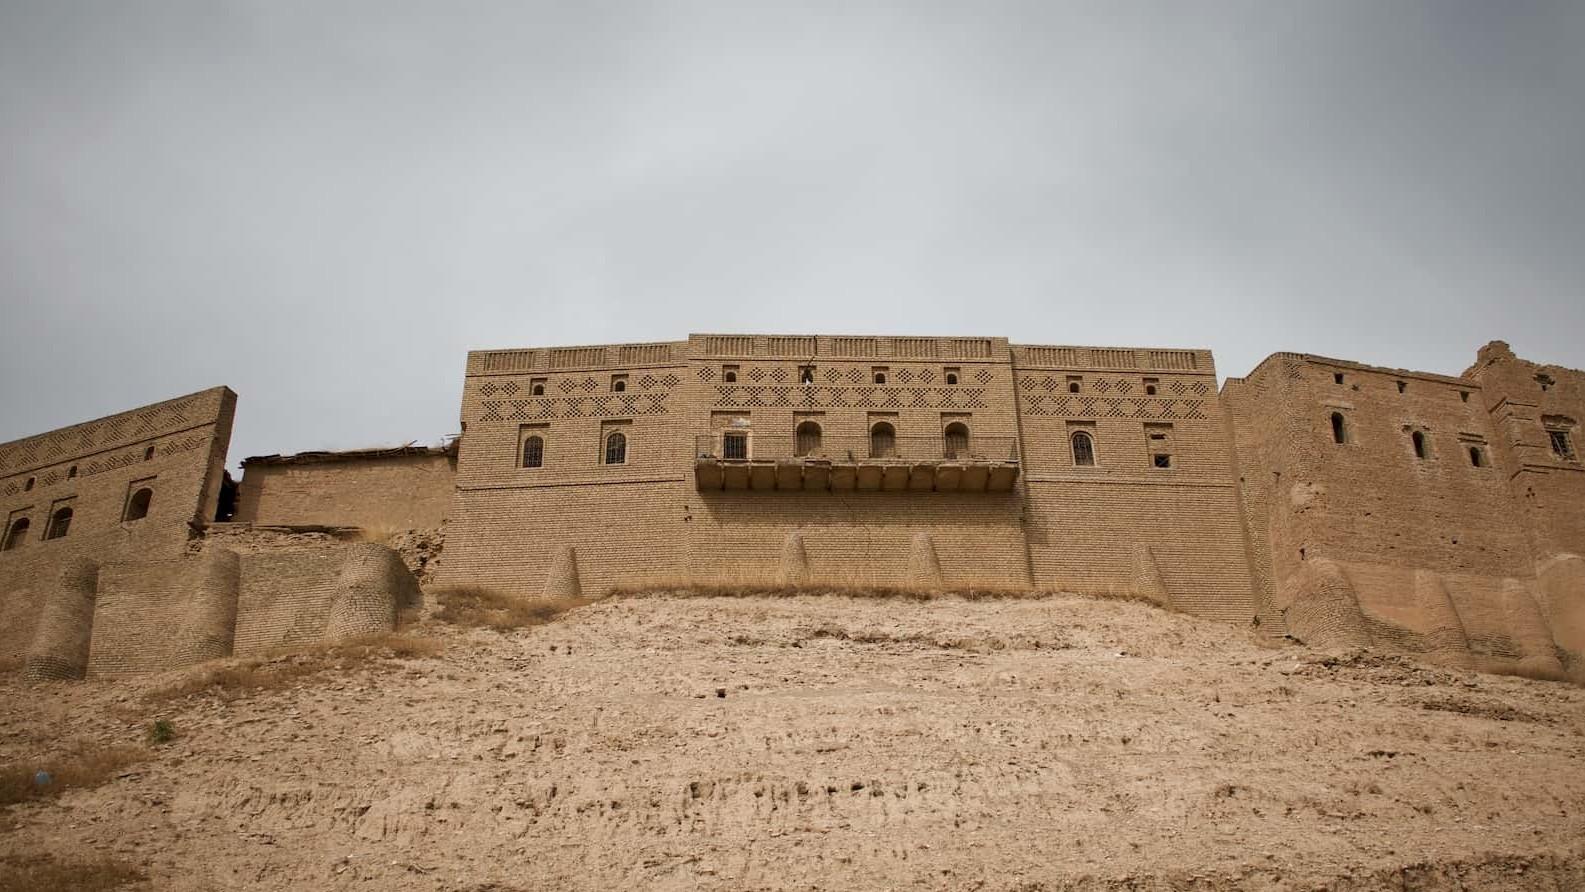 Perimeter wall of the Erbil Citadel in Iraq